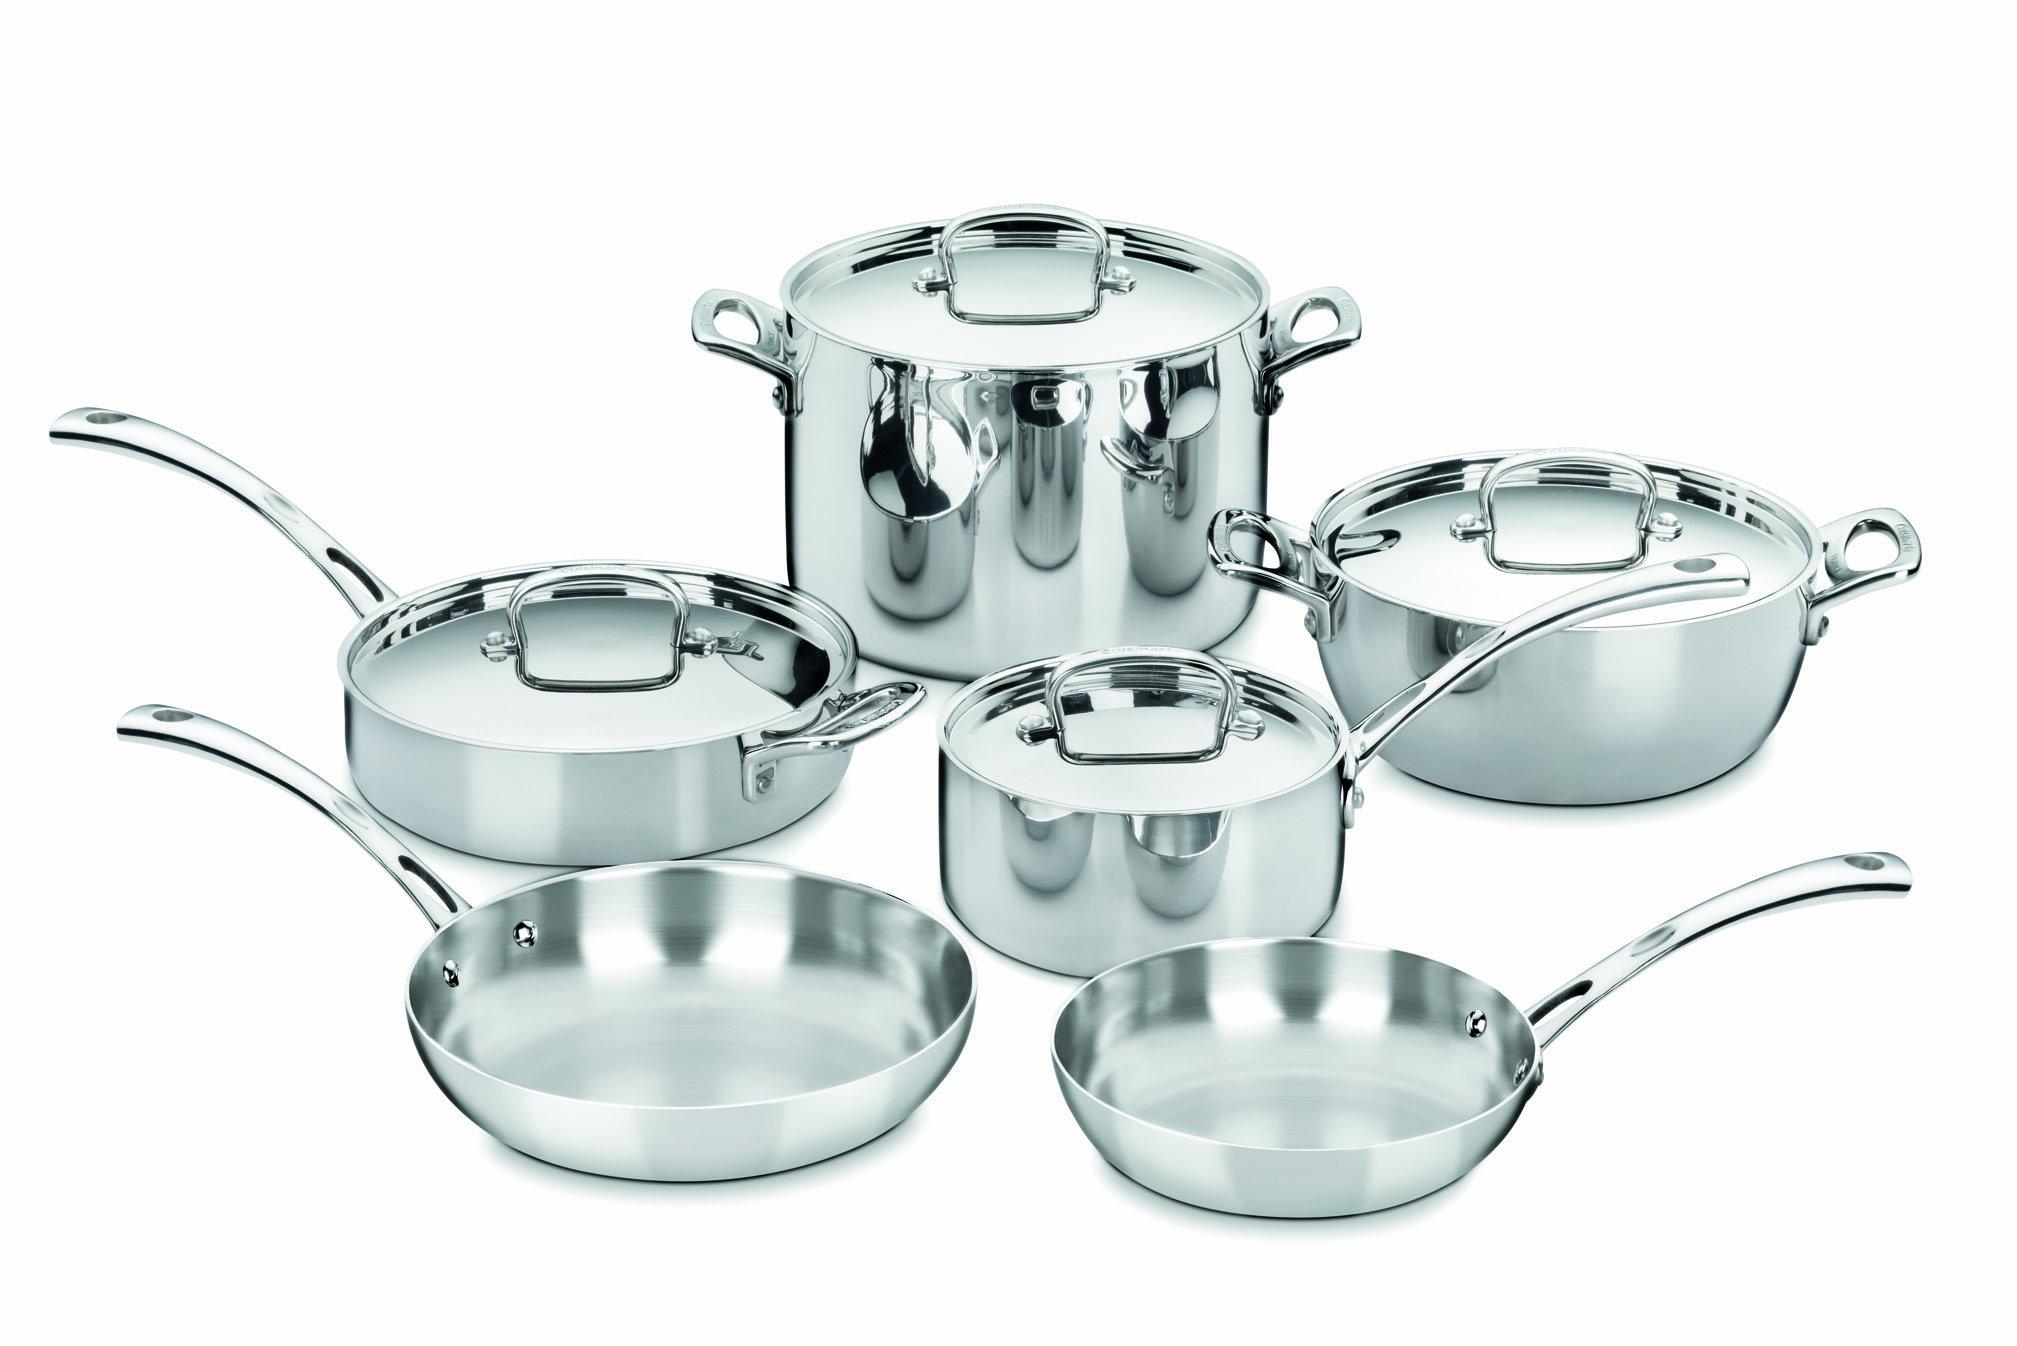 Cuisinart FCT 10 Stainless 10 Piece Cookware